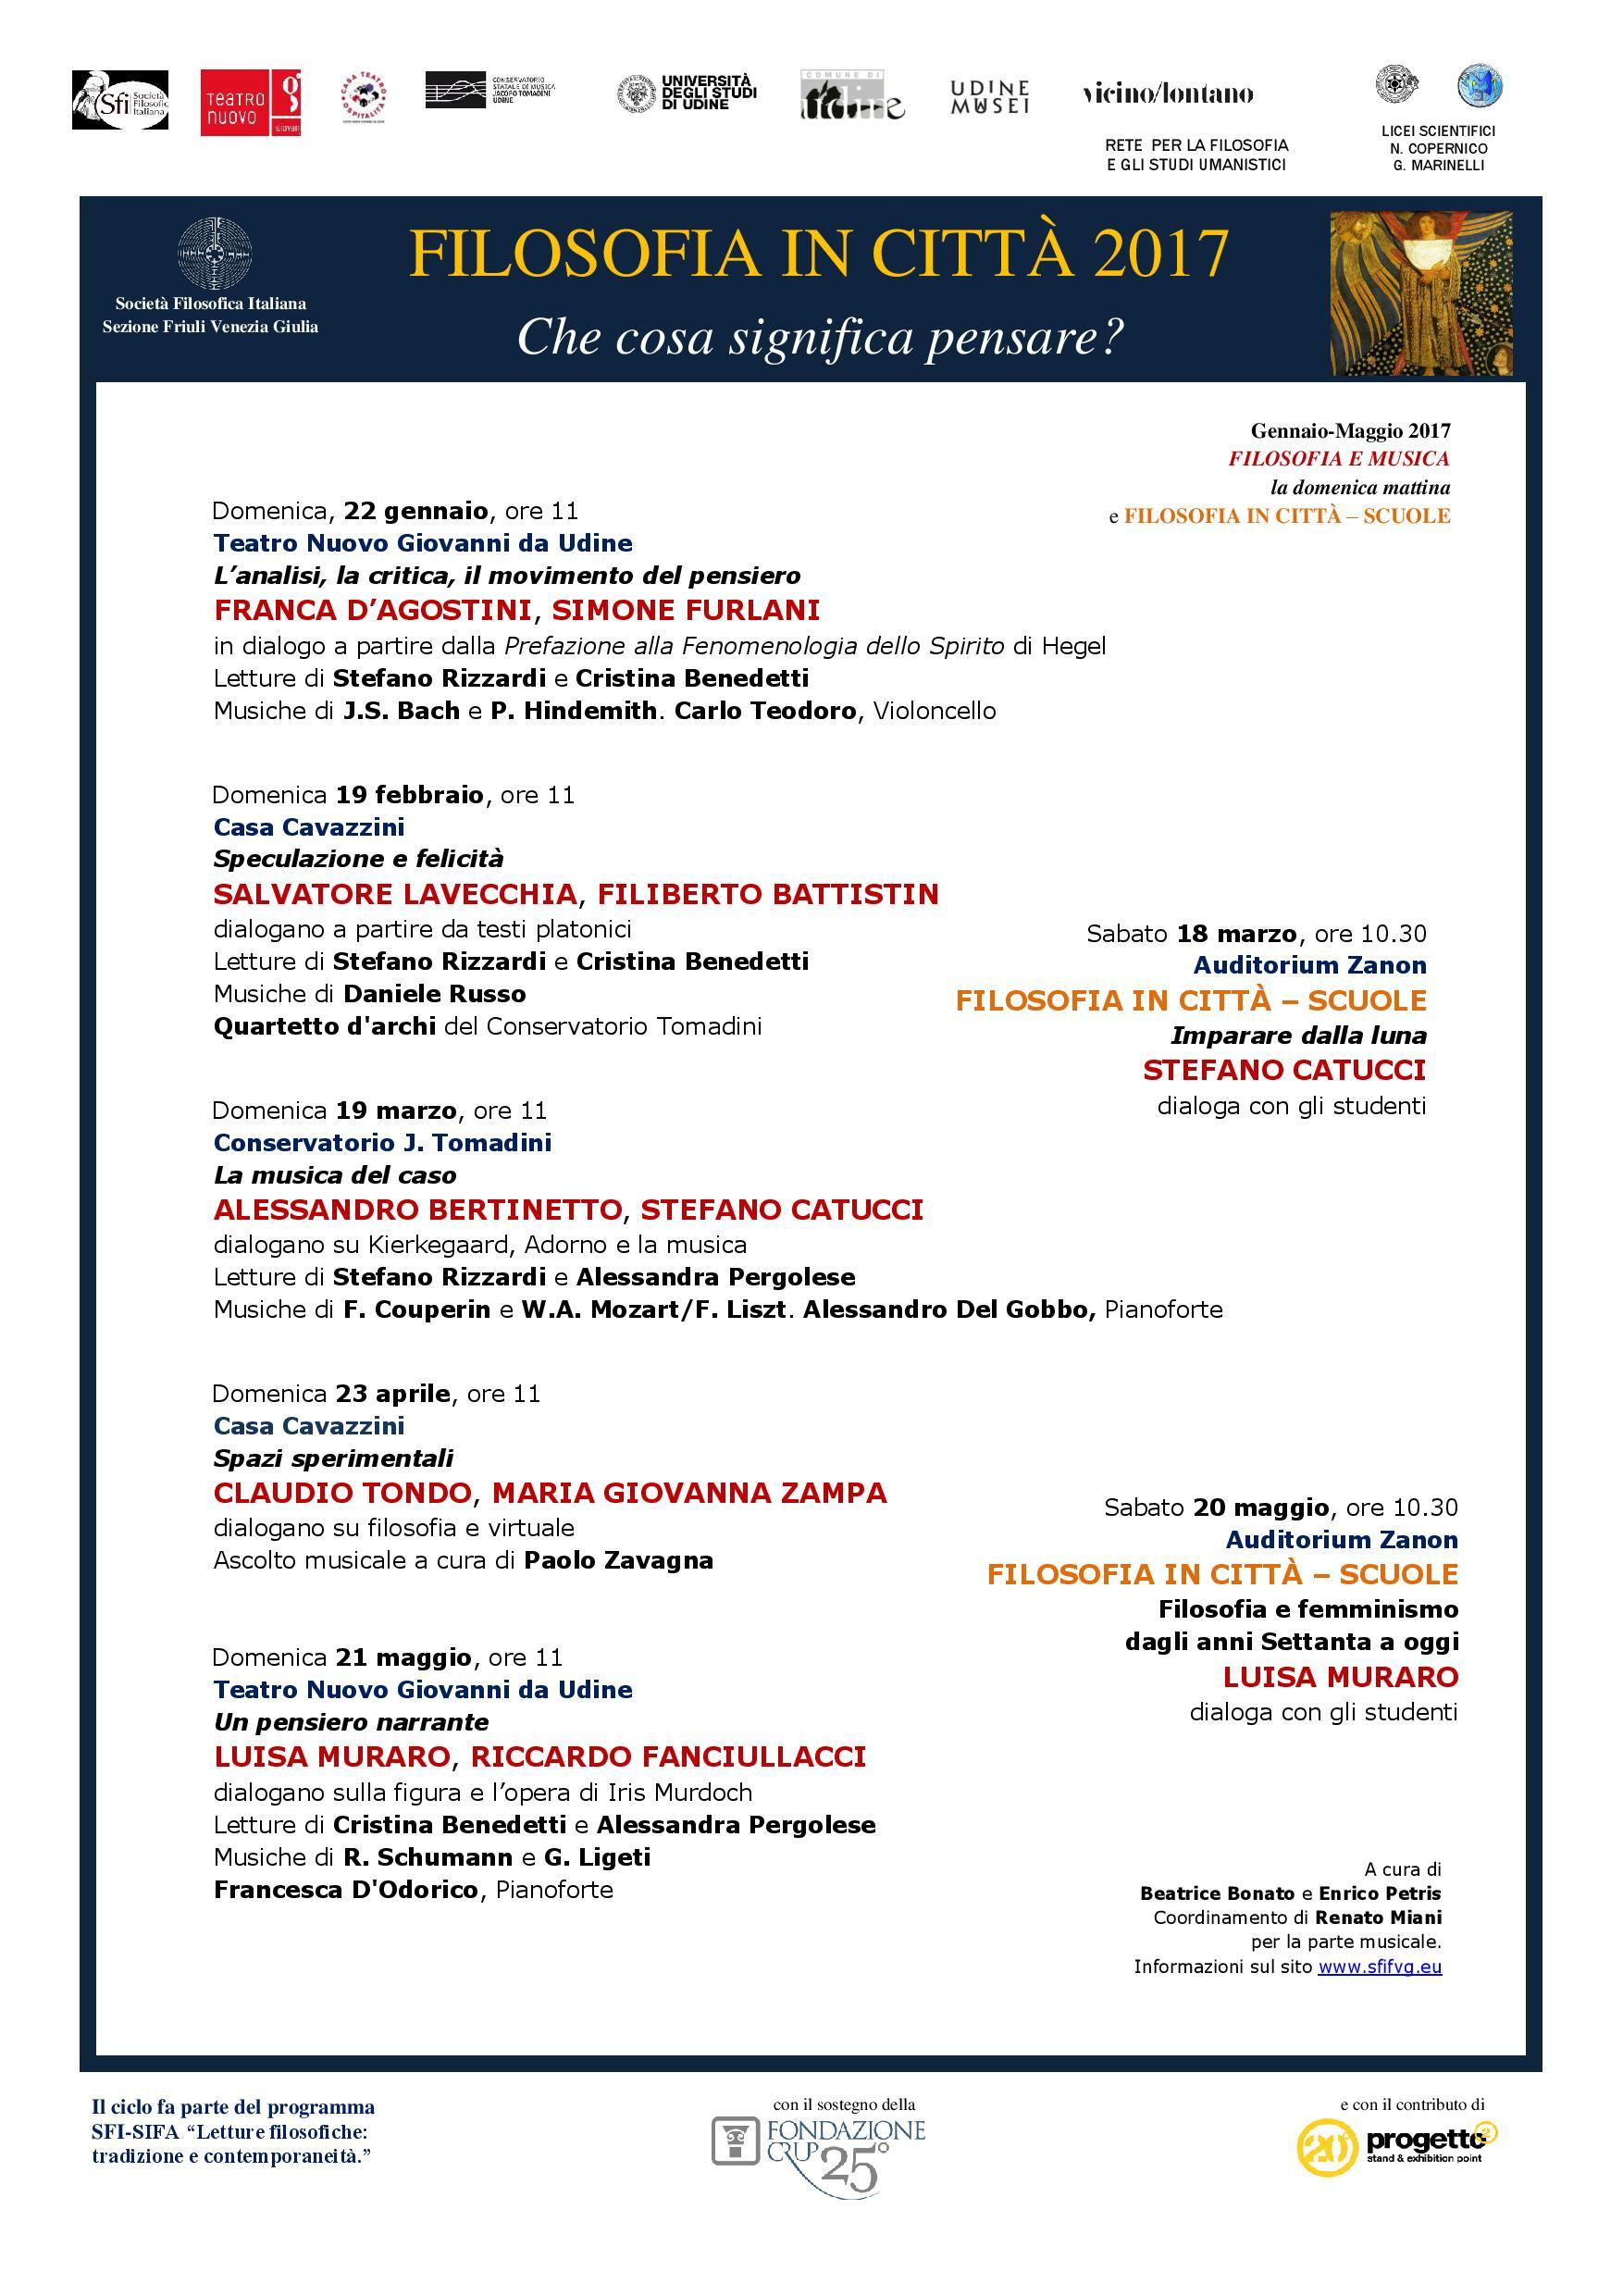 Locandina-FILOSOFIA-IN-CITTA-2017